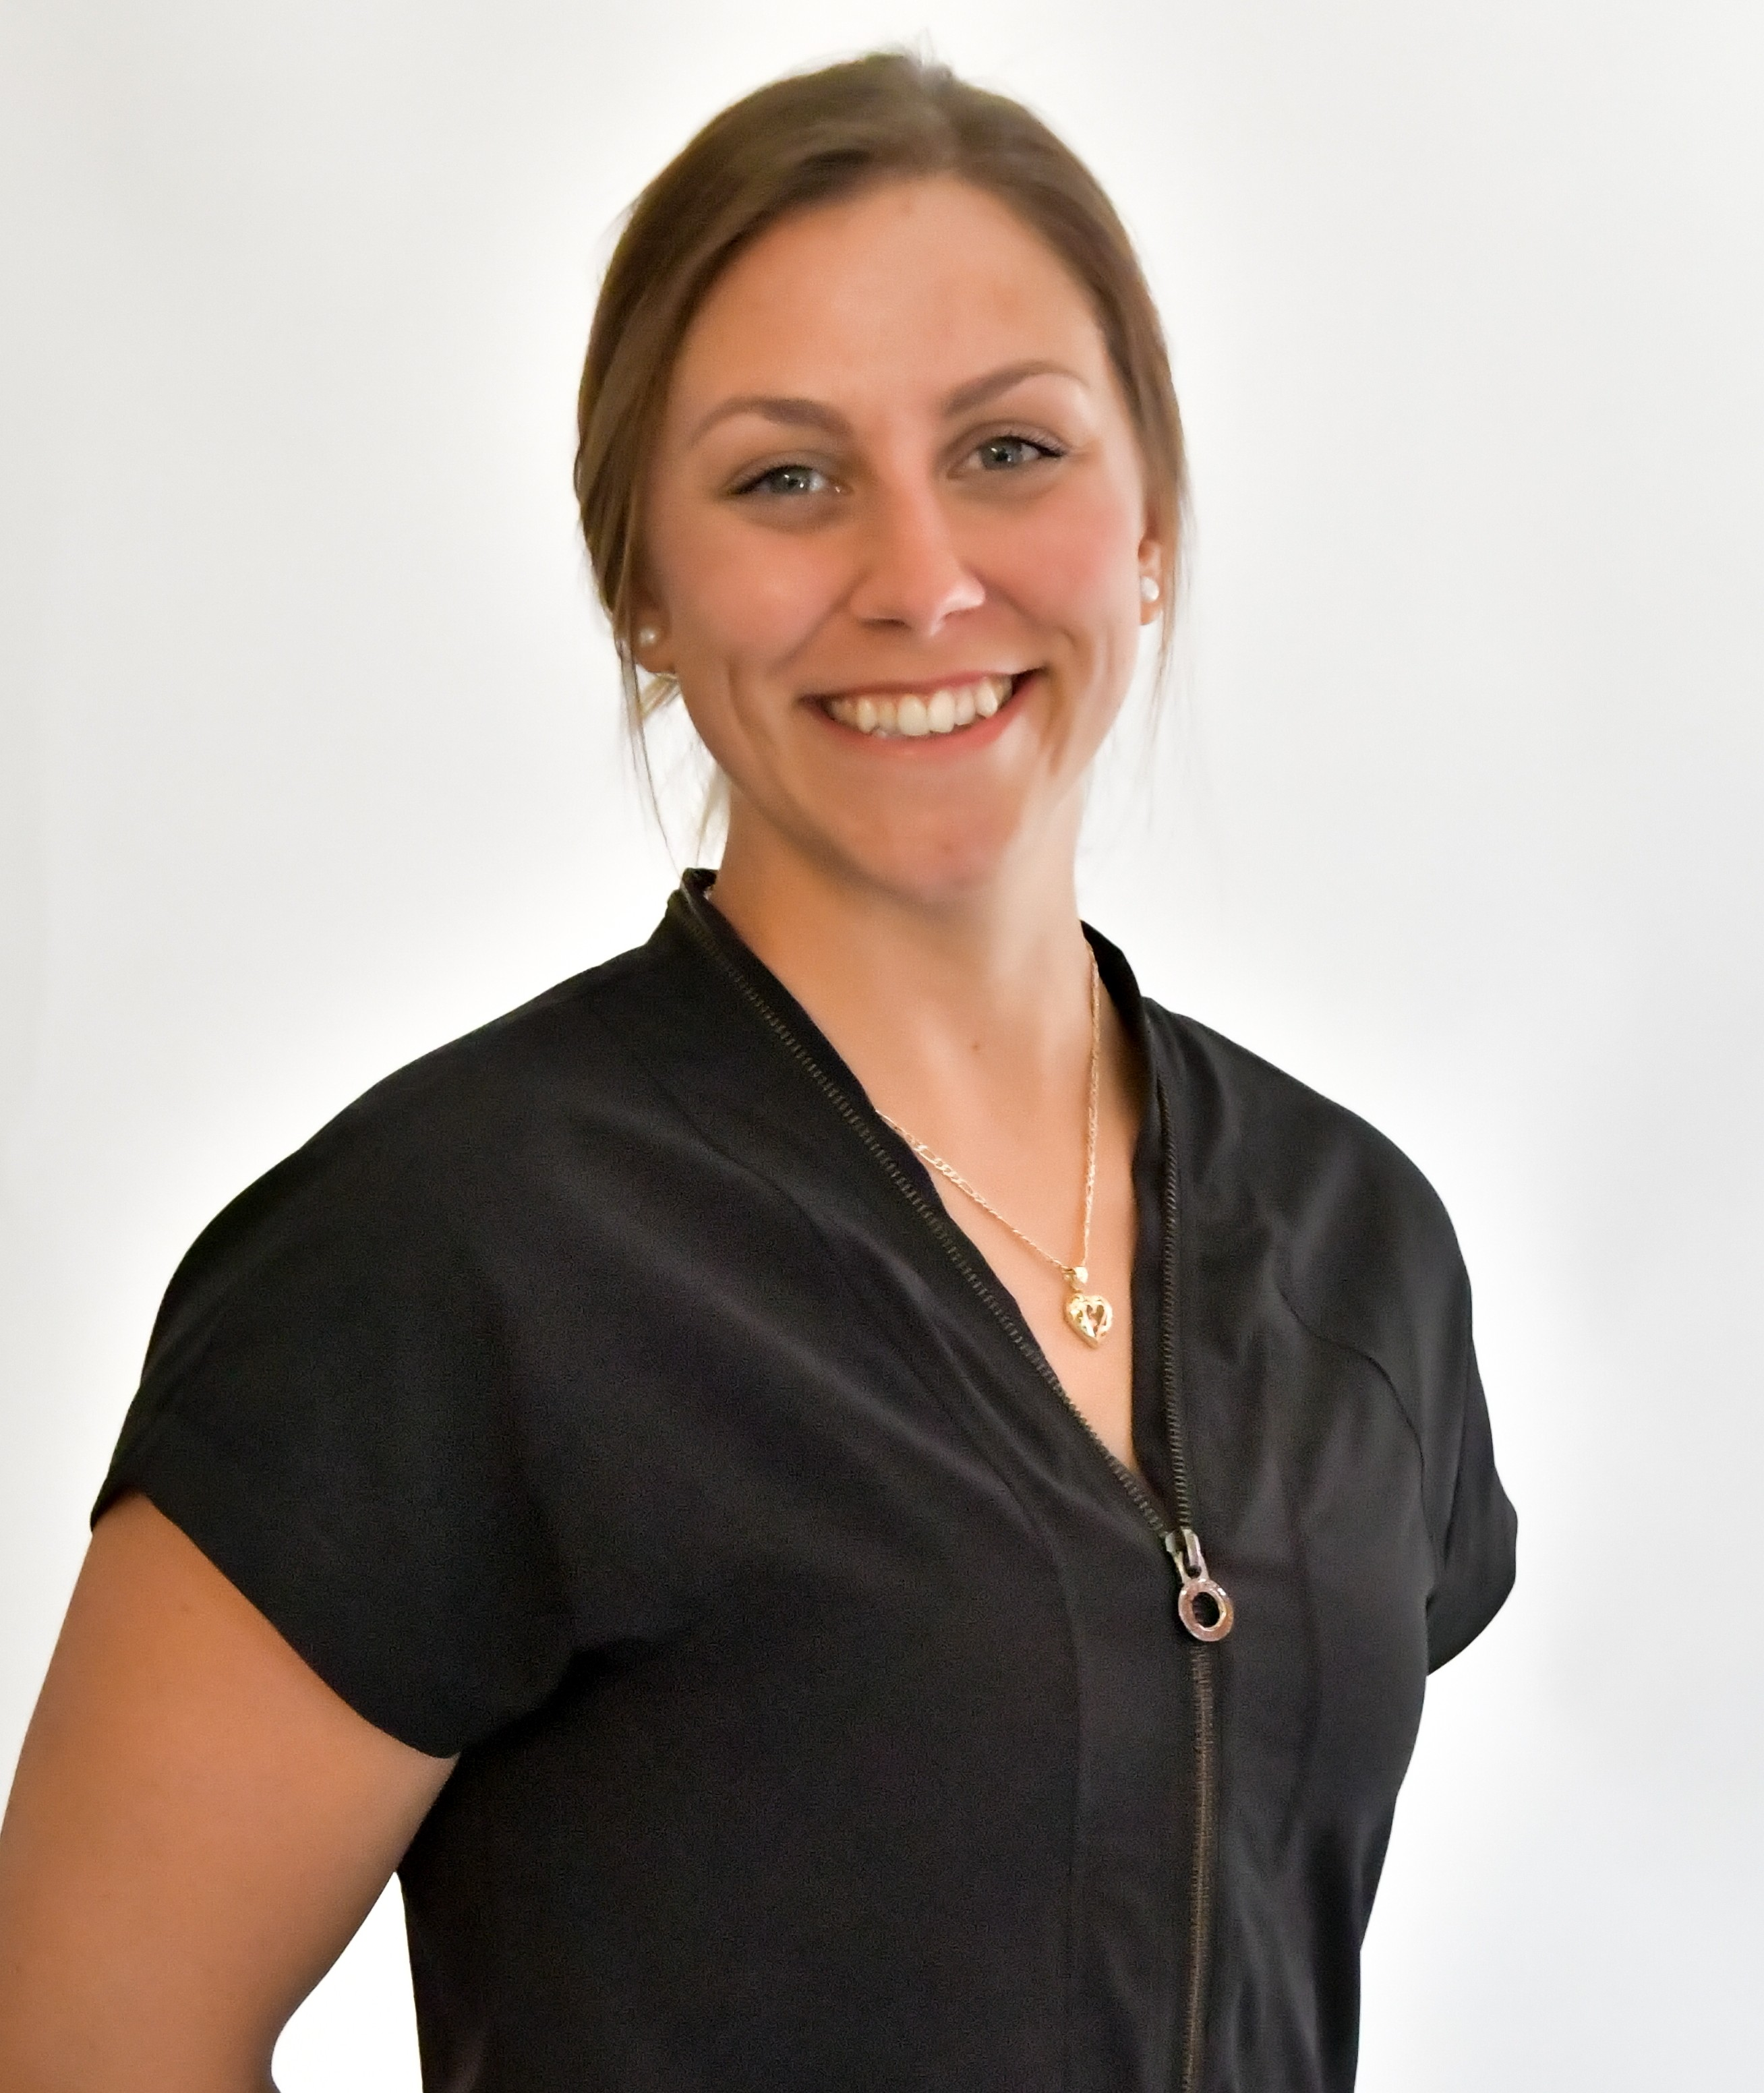 Sarah Moreau